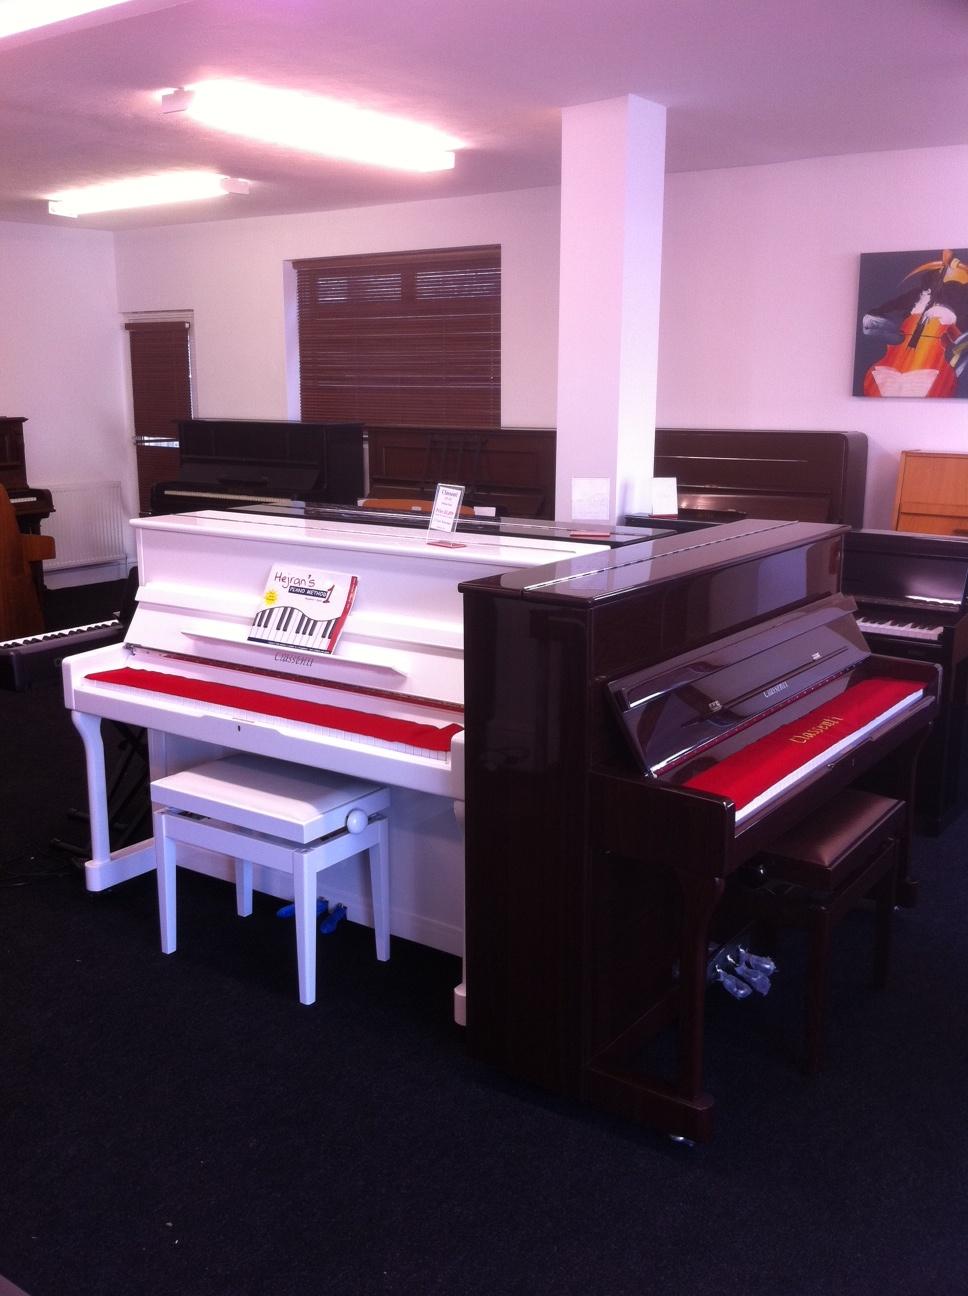 used digital pianos second hand yamaha clavinova roland casio. Black Bedroom Furniture Sets. Home Design Ideas